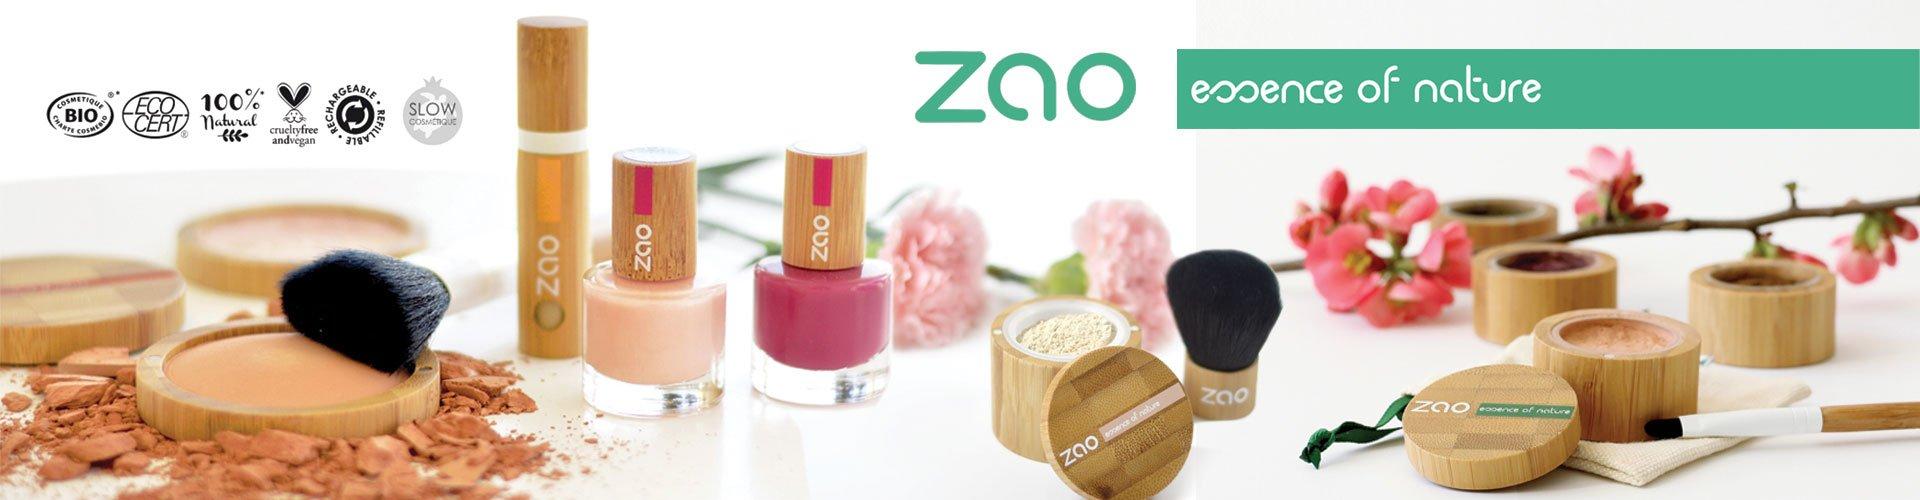 ONTS Φυσικά και Βιολογικά Προϊόντα Μακιγιάζ. ZAO MAKE UP. Προϊόντα μακιγιάζ ενεργά συστατικά που προέρχονται από οργανικά καλλιεργημένα φυτά. Με δυνατότητα αναπλήρωσης / ανταλλακτικά